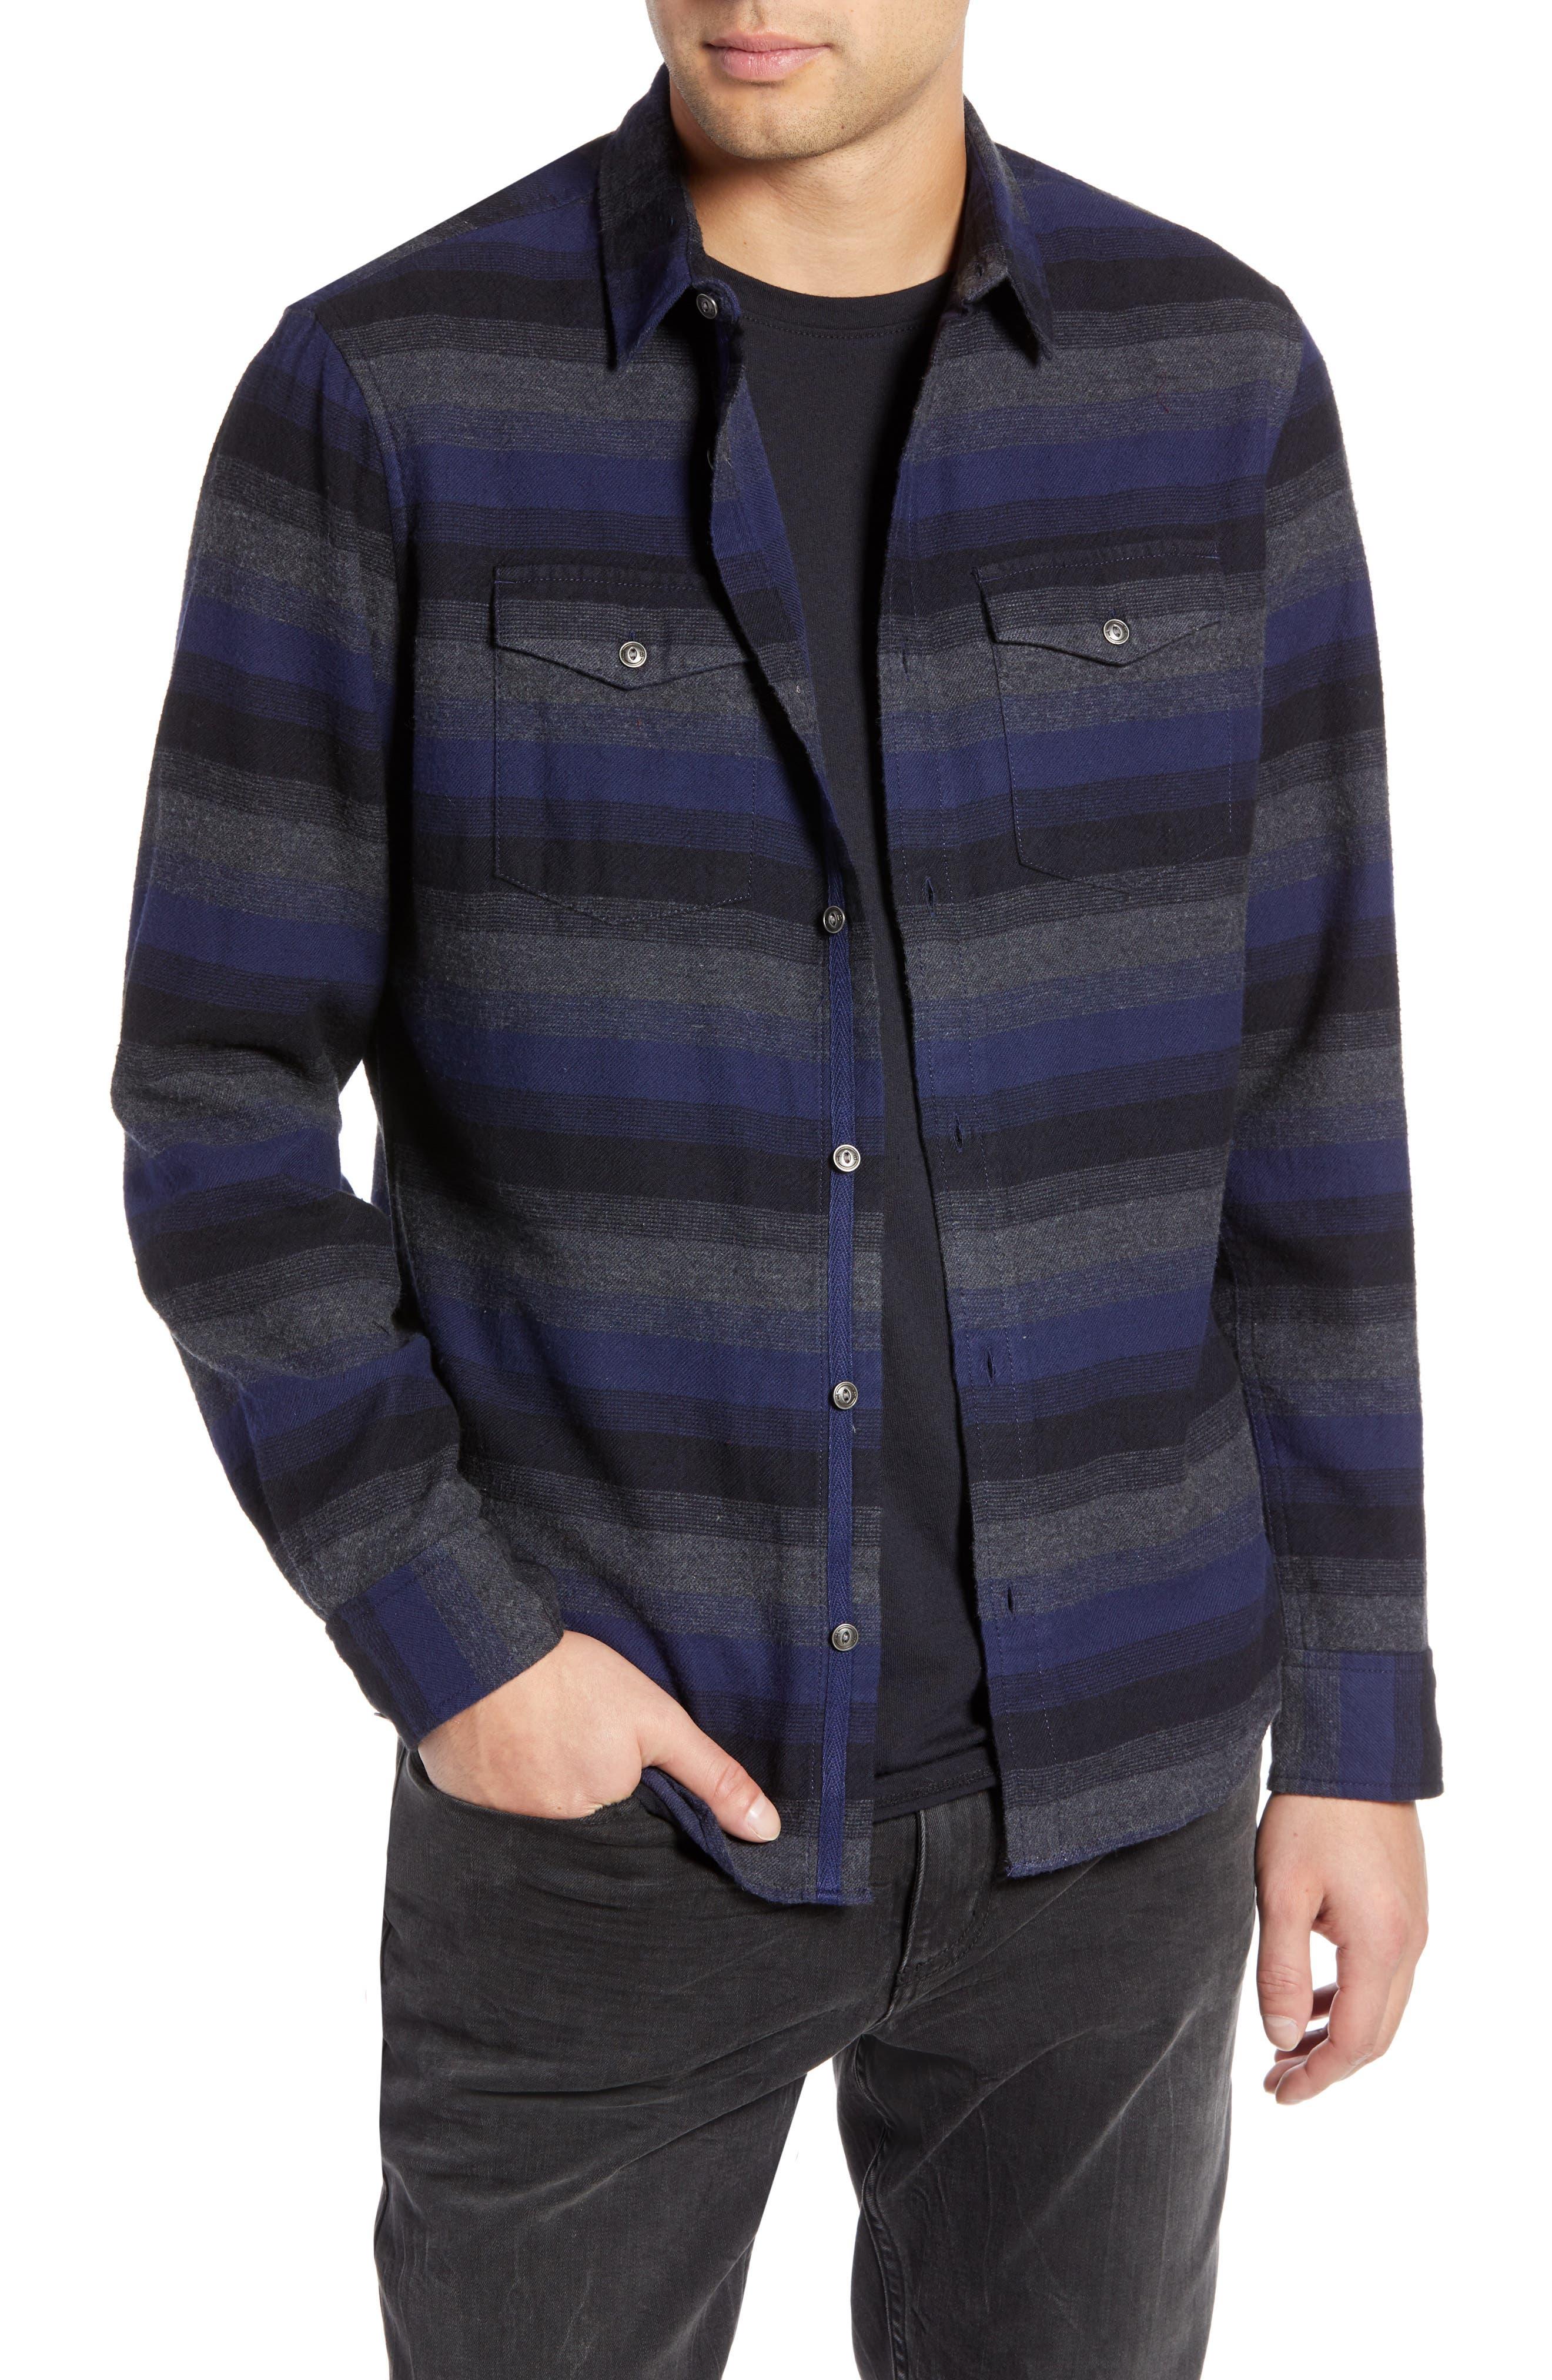 Regular Fit Ombré Sport Shirt,                             Main thumbnail 1, color,                             NAVY CHARCOAL OMBRE STRIPE